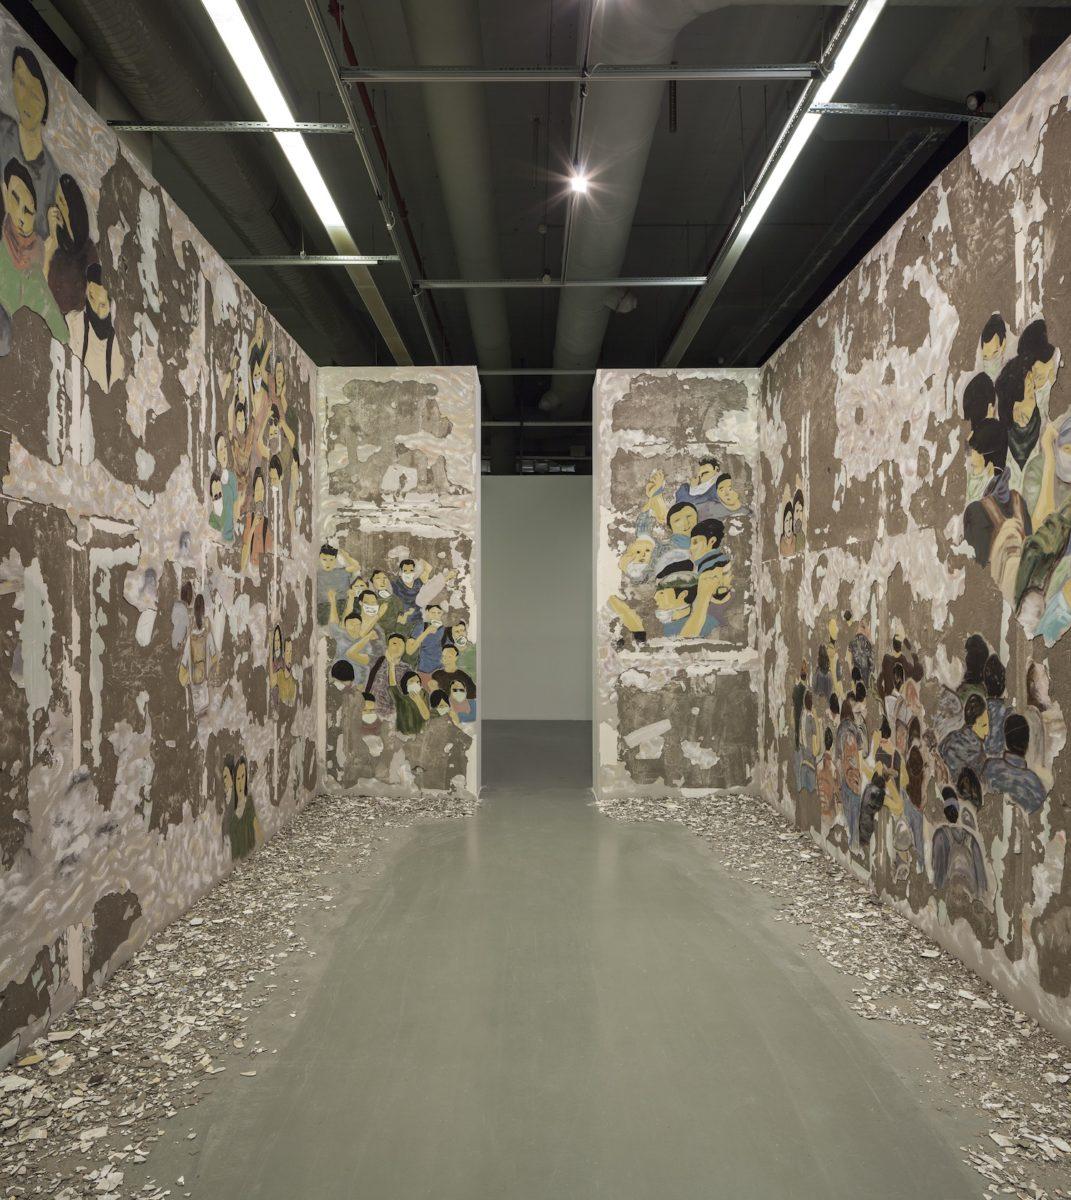 Latifa Echkch, Crowd Fade, 2017, Fresko. Courtesy Galerie Kamel Mennour, Kaufmann Repetto, Eva Presenhuber, Dvir Gallery. Foto Sahir Ugur Eren